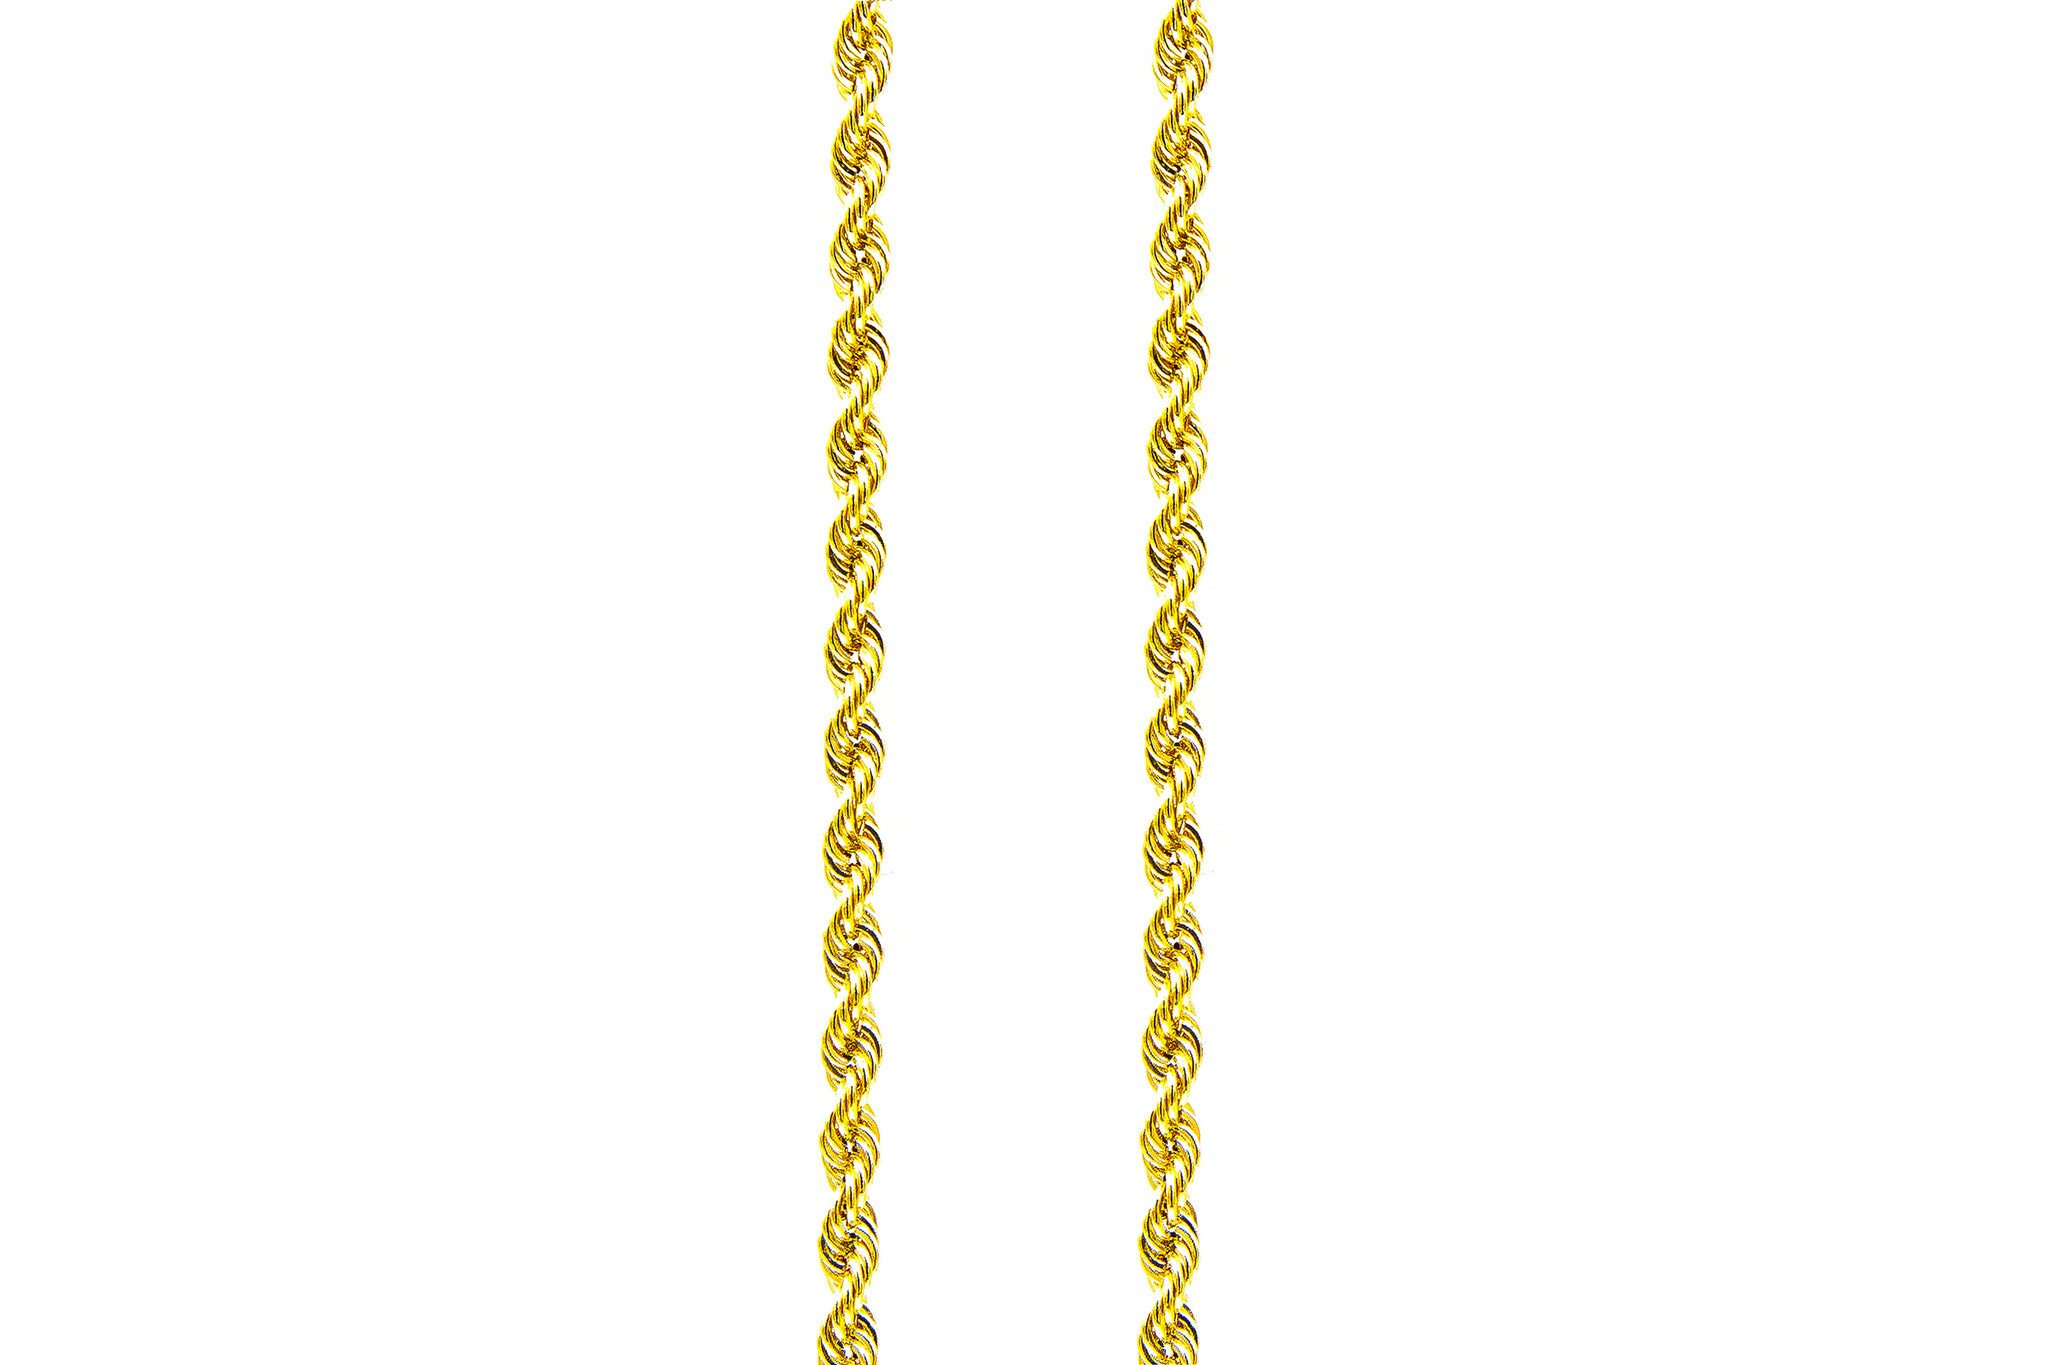 Rope chain Surinaams goud 14kt 2mm-3